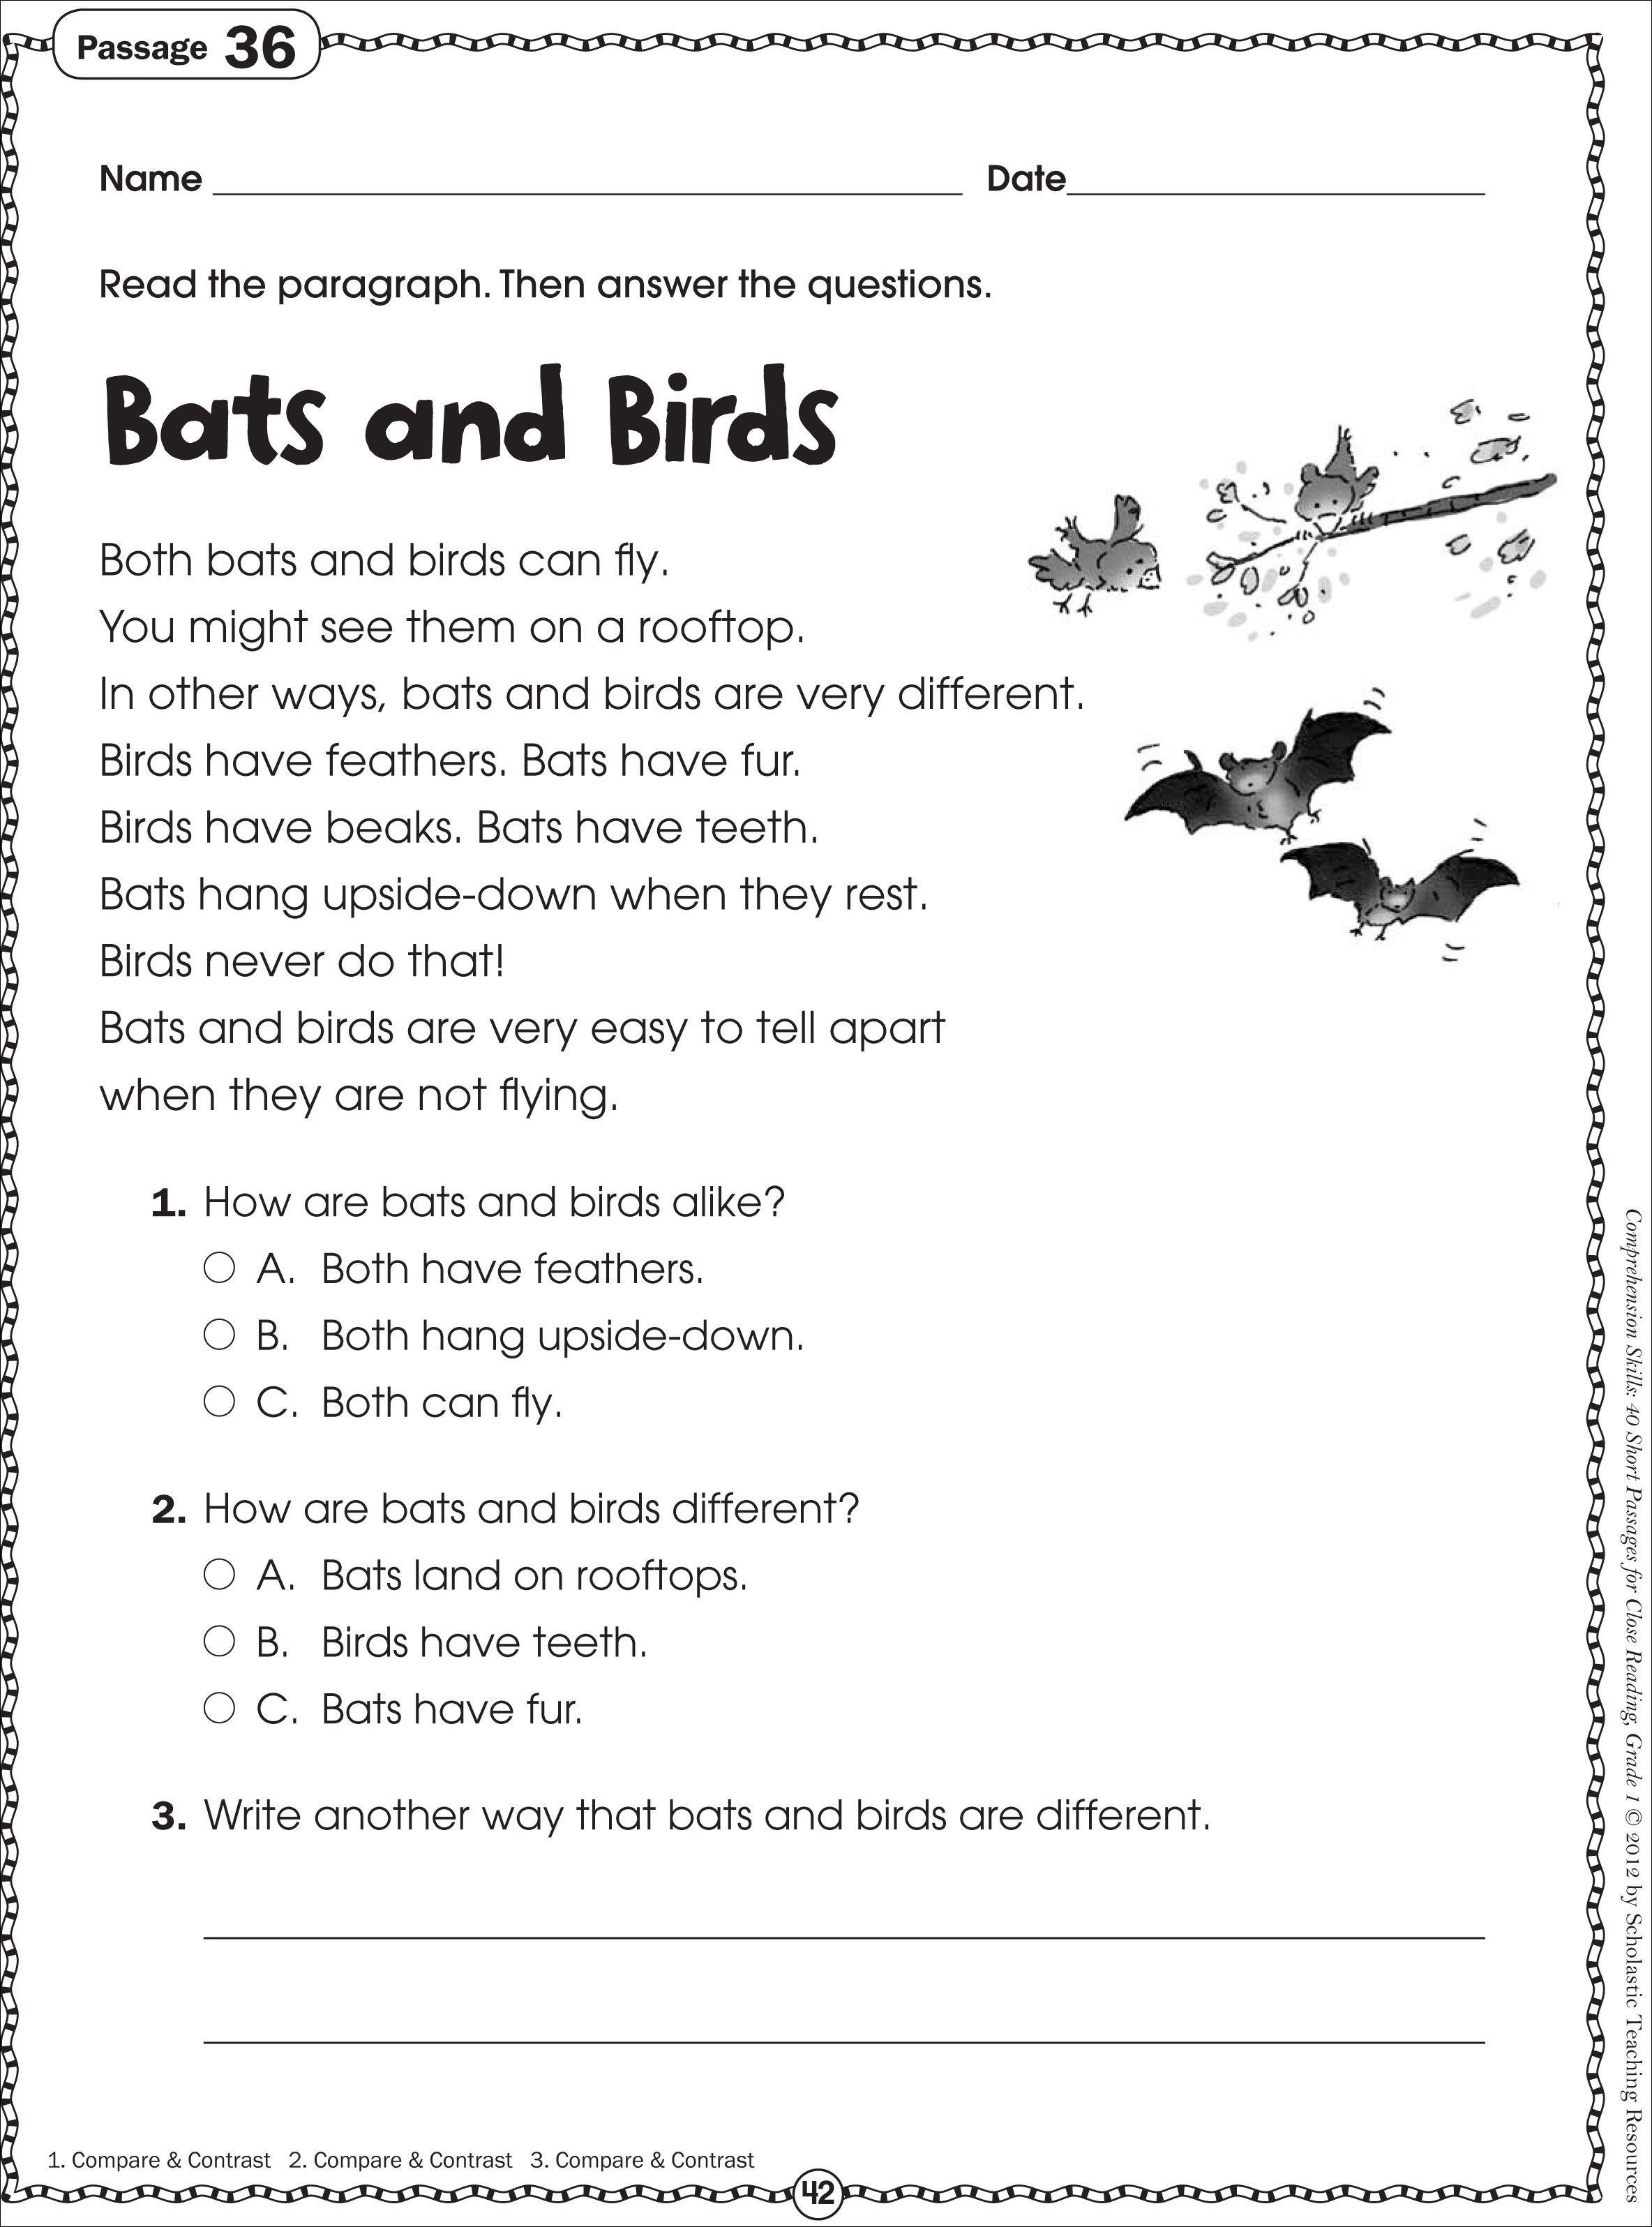 Free Printable Reading Comprehension Worksheets For Kindergarten - Free Printable Hindi Comprehension Worksheets For Grade 3